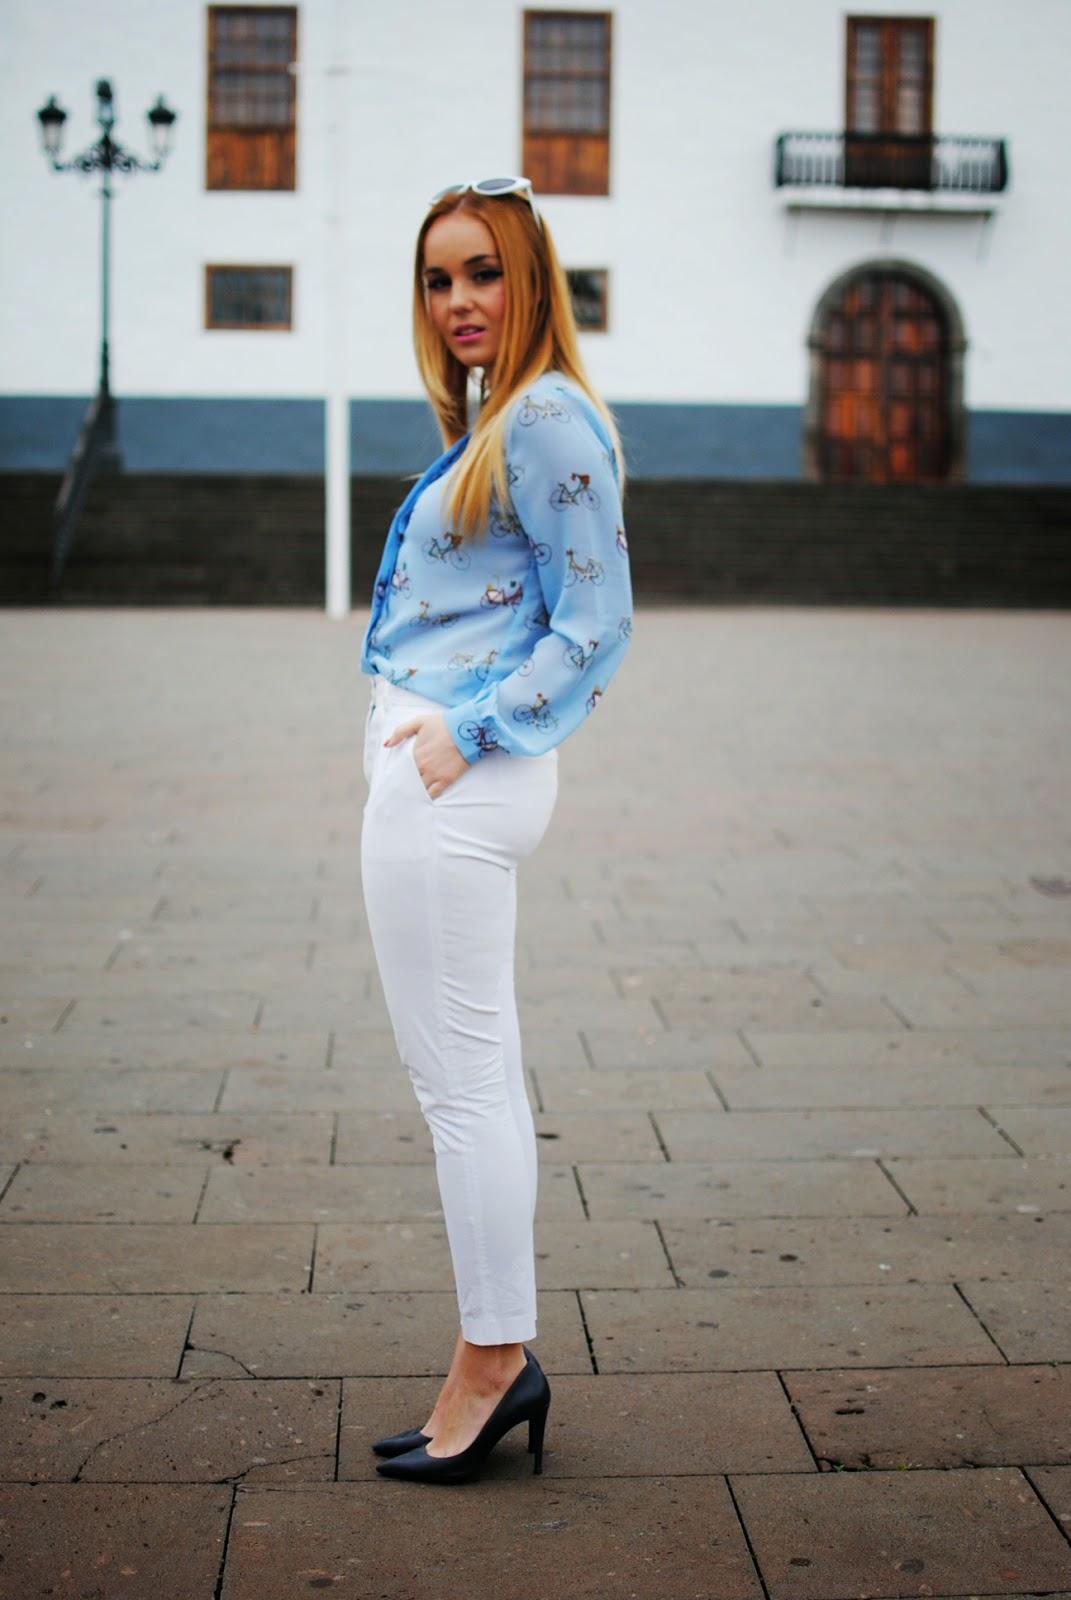 nery hdez, blonde, sugarhill , white pants, zerouv sunglasses, cat sunglasses